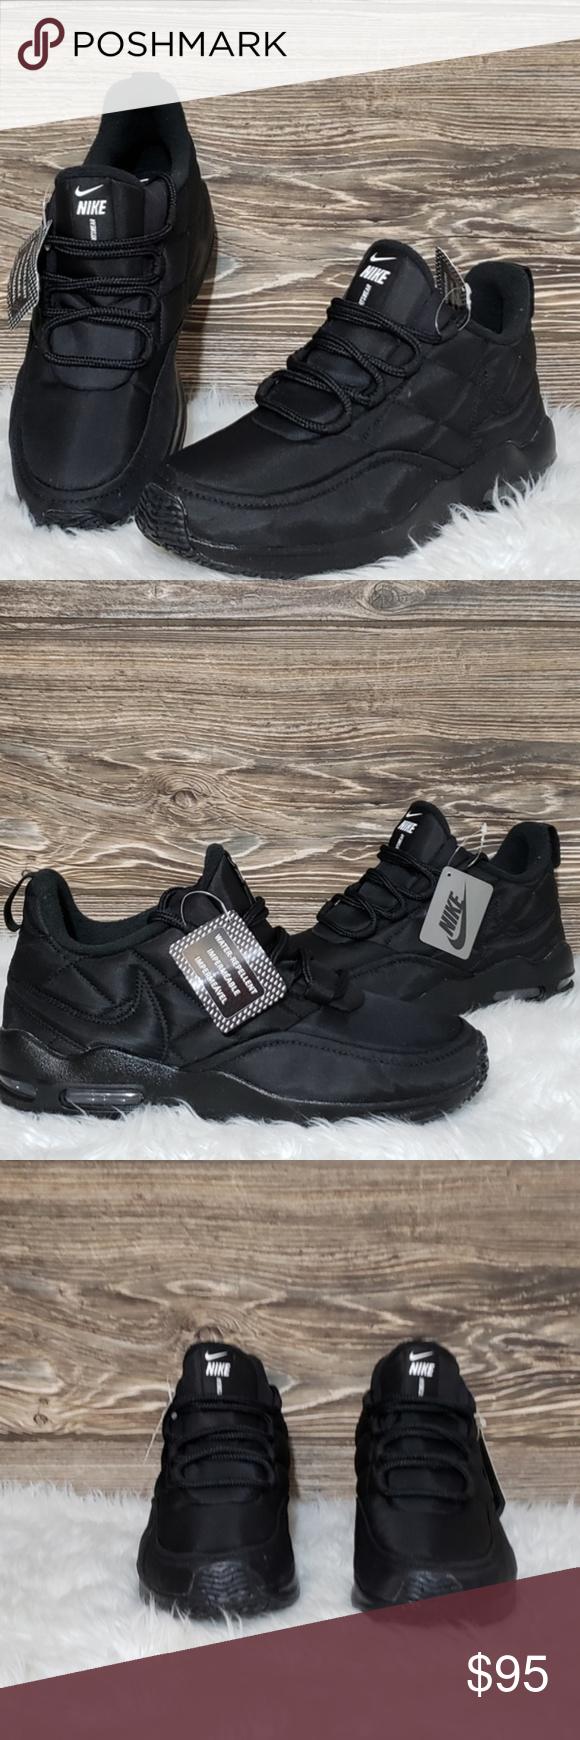 Black running shoes, Nike air max